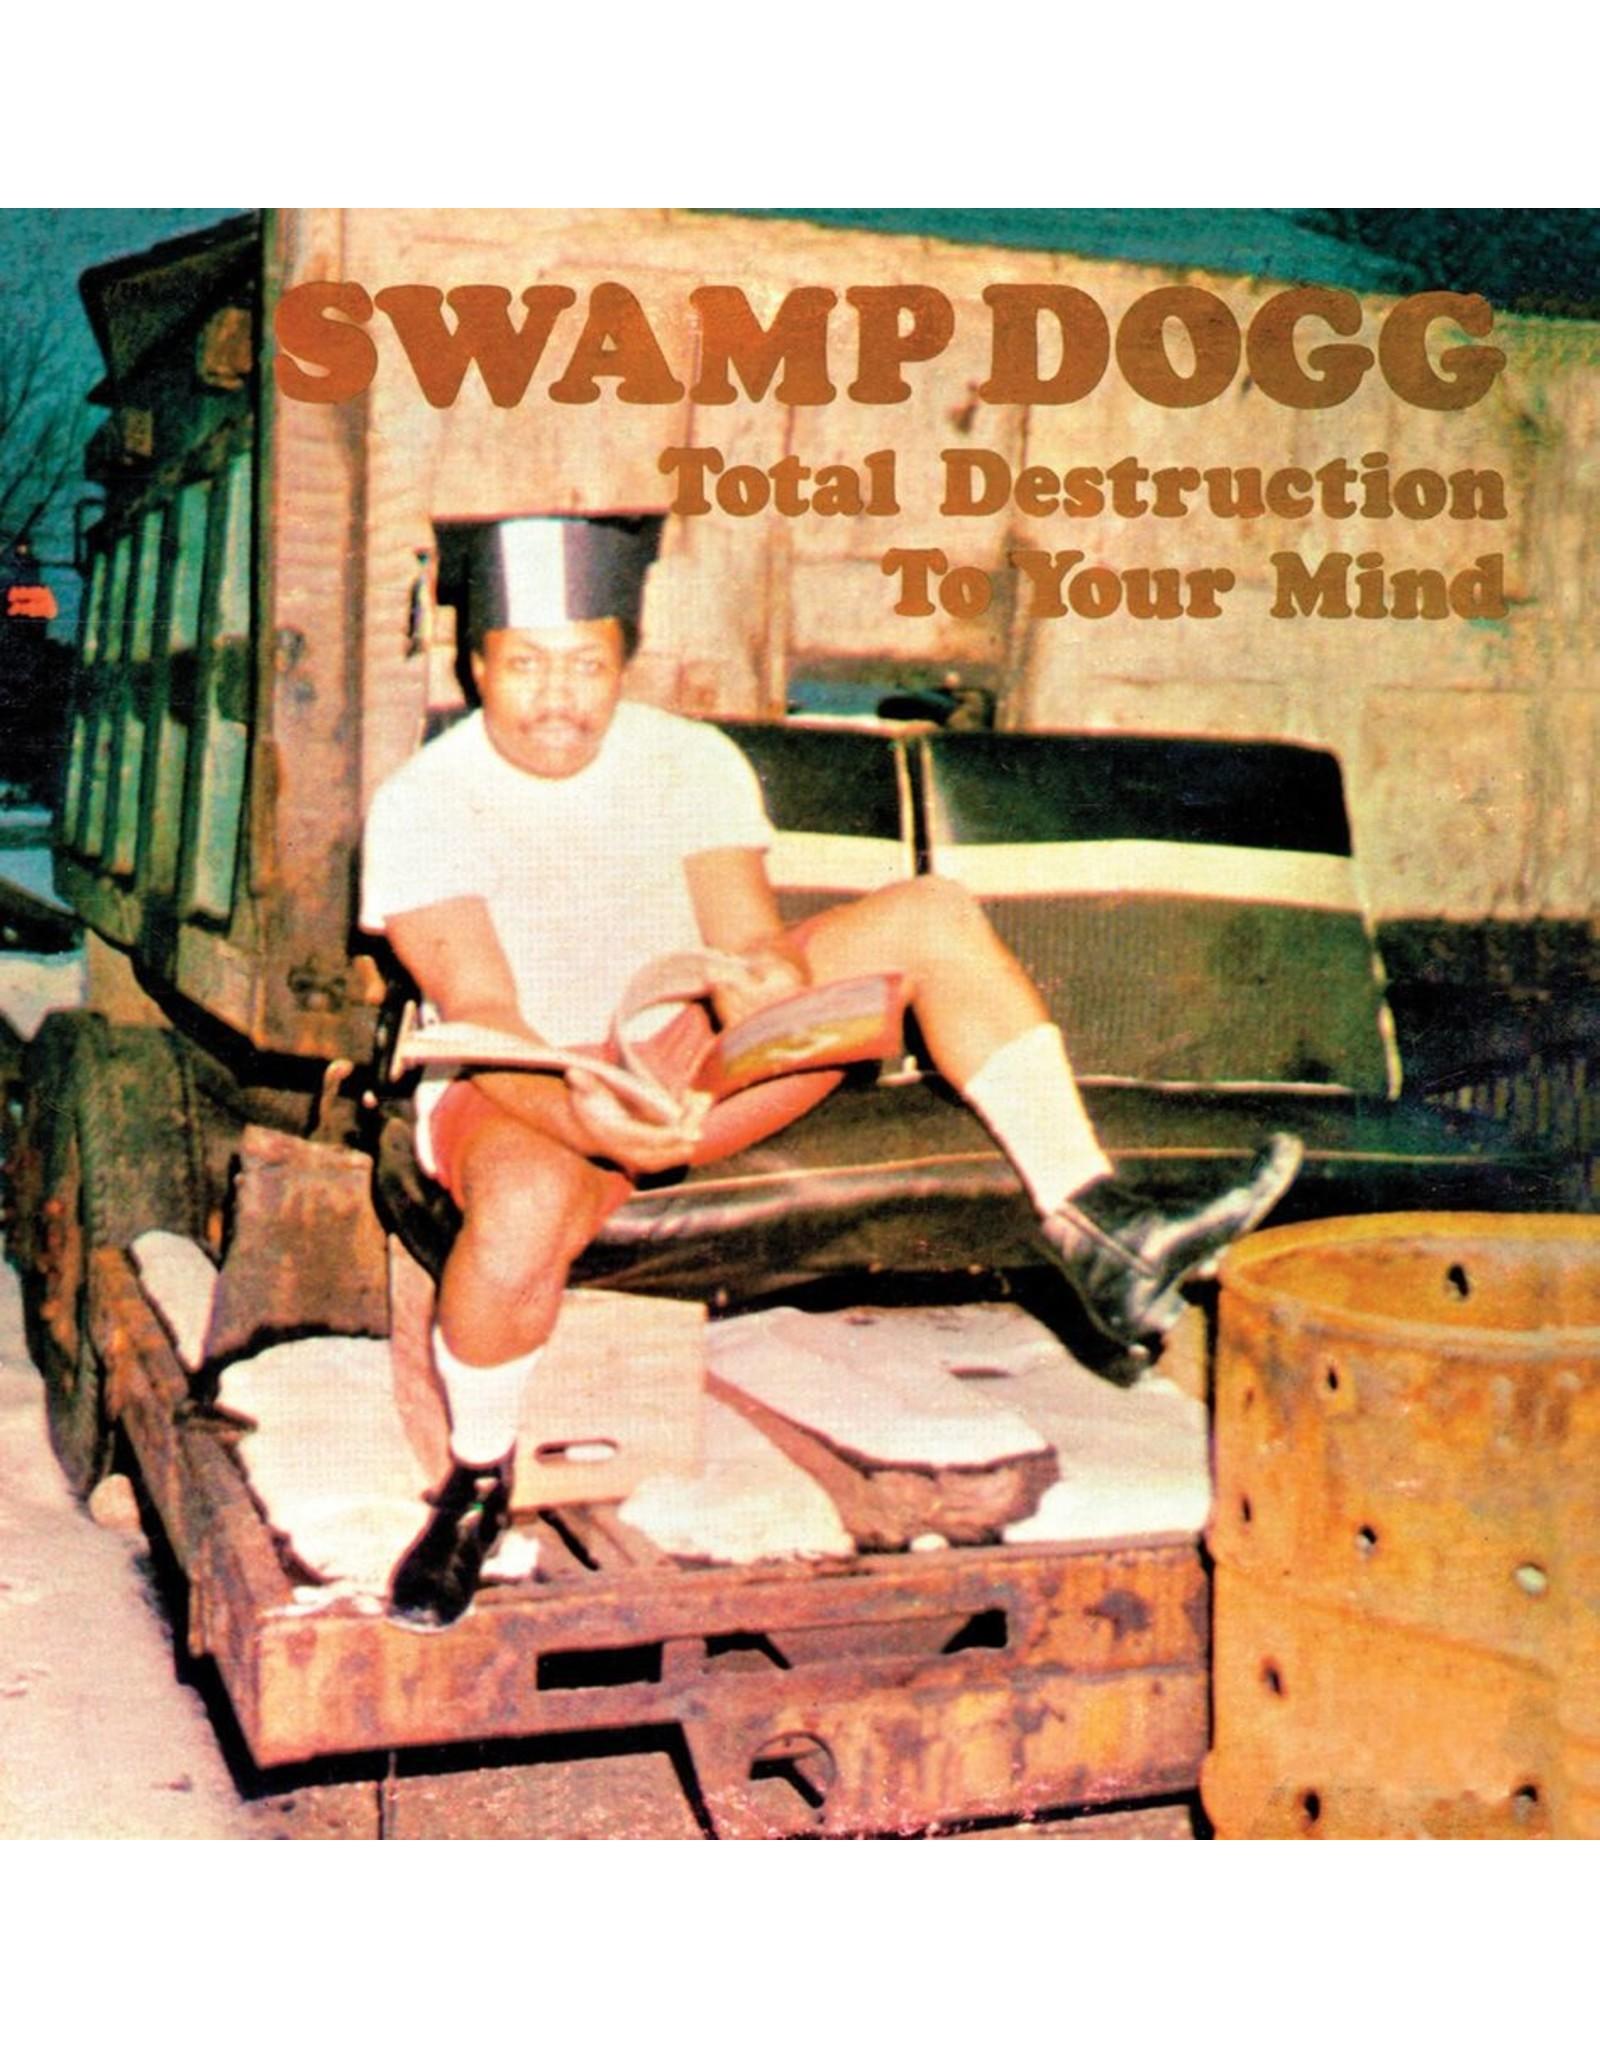 New Vinyl Swamp Dogg - Total Destruction To Your Mind LP